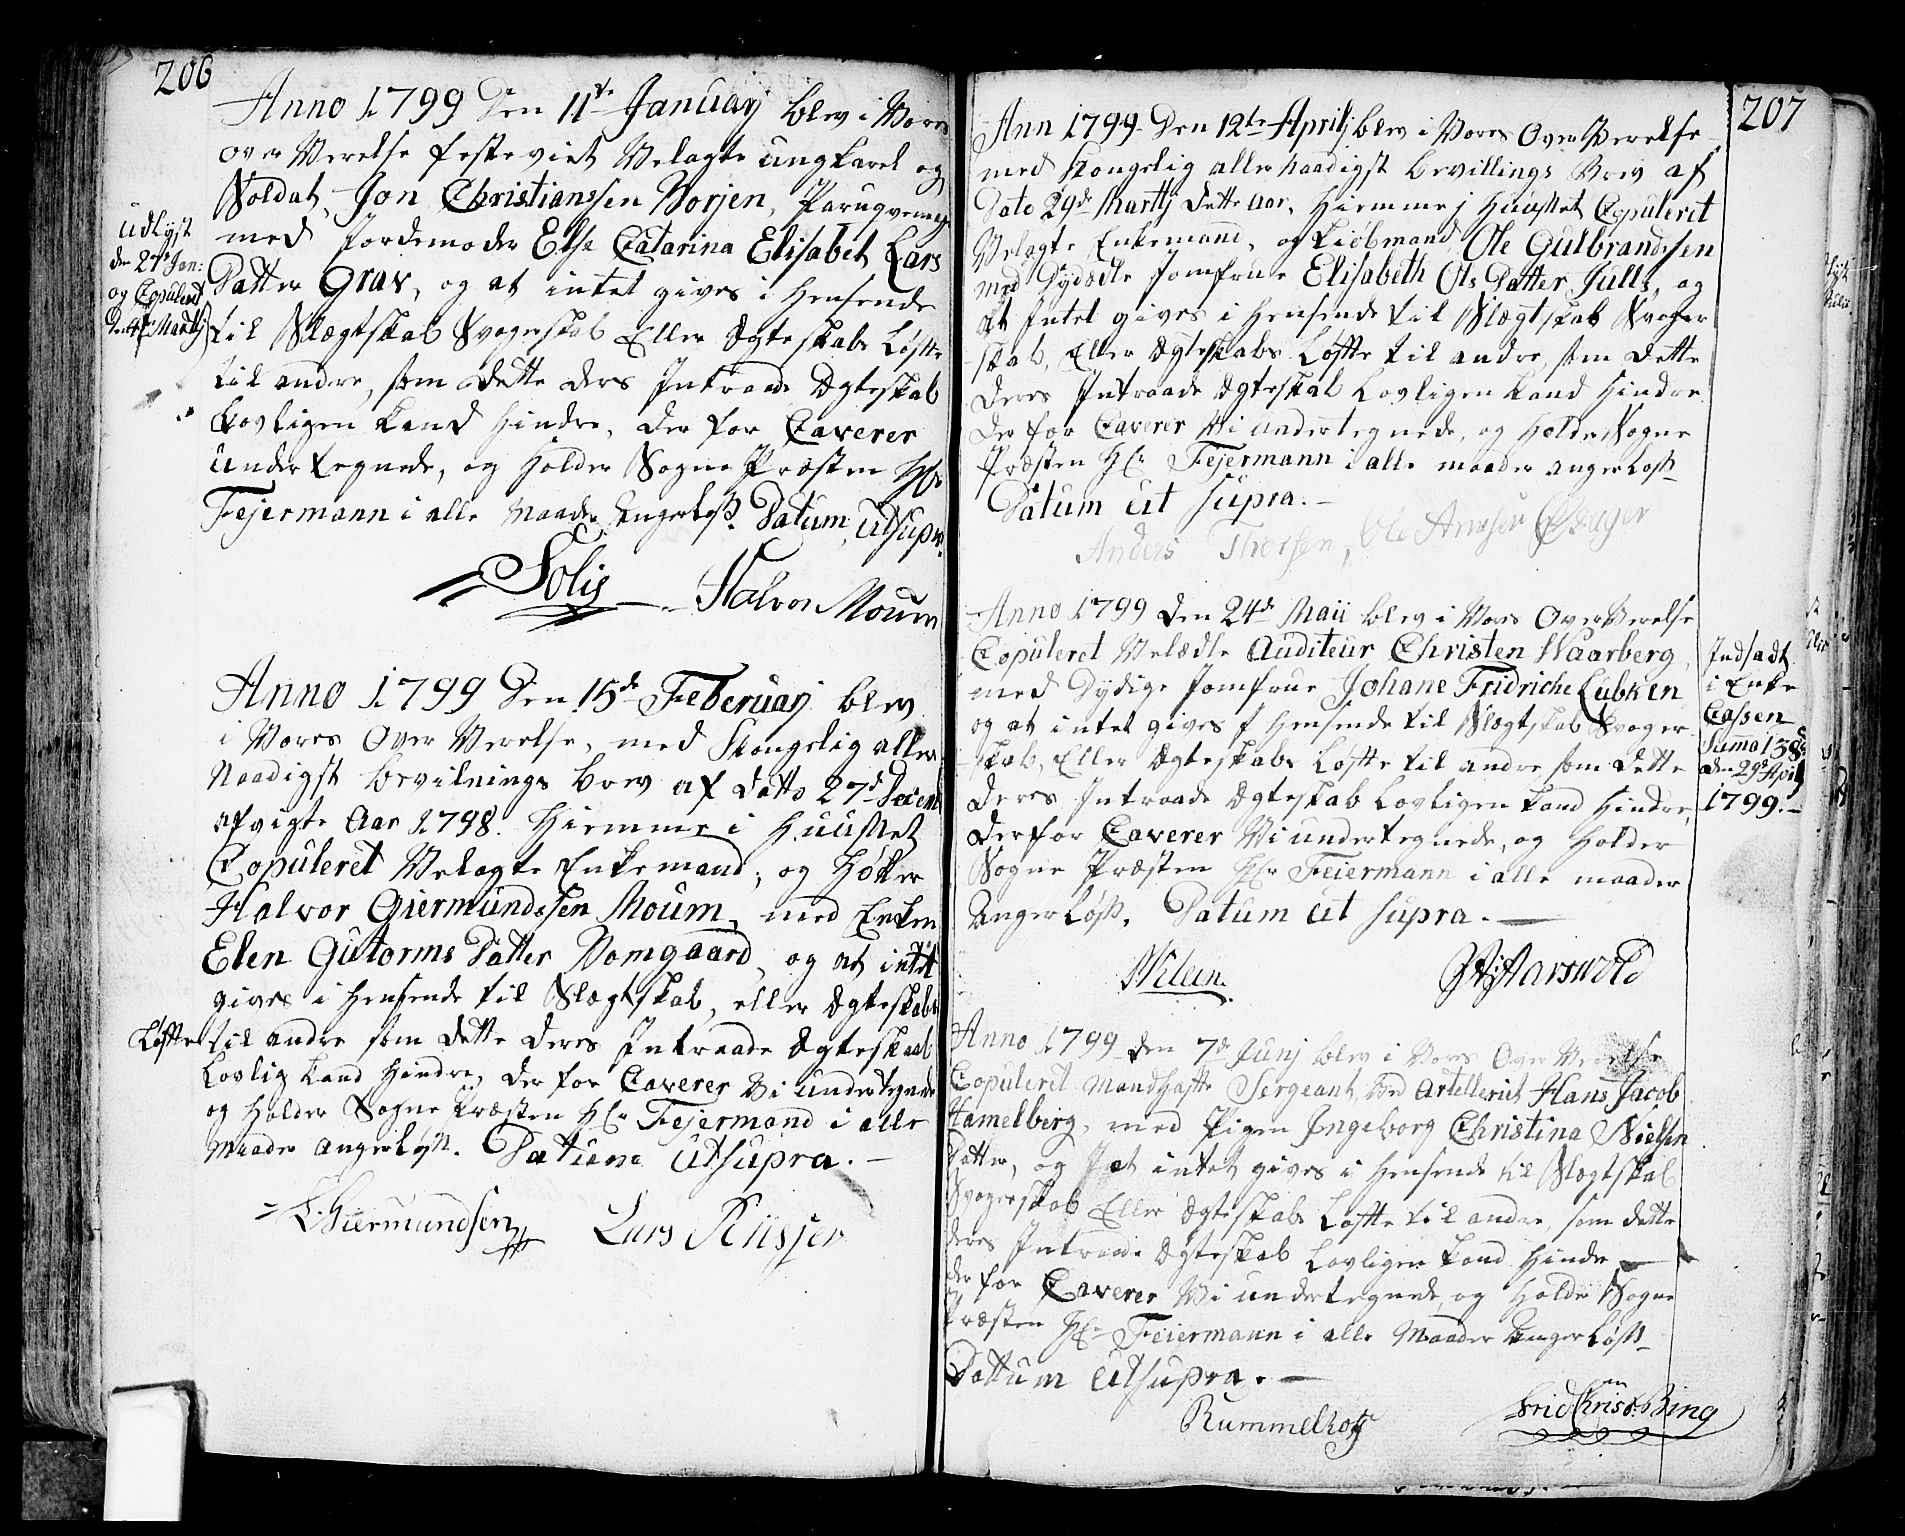 SAO, Fredrikstad prestekontor Kirkebøker, F/Fa/L0002: Ministerialbok nr. 2, 1750-1804, s. 206-207